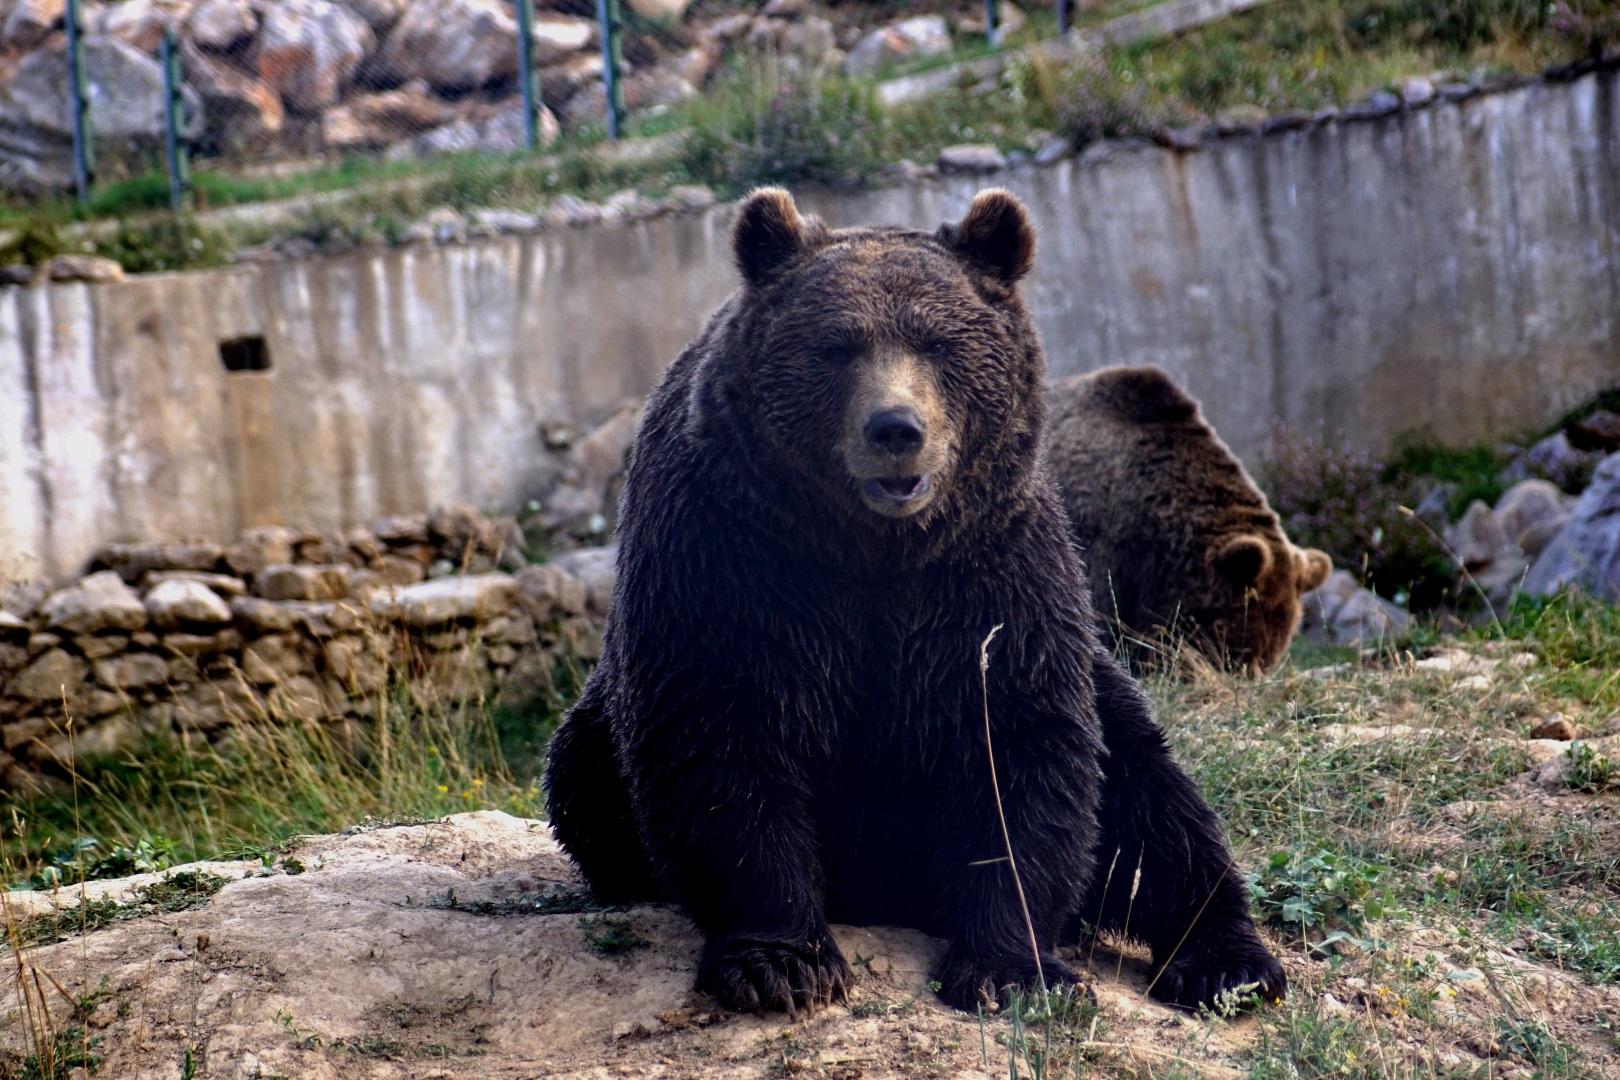 Visiter Le refuge des ours de Kuterevo - Croatie